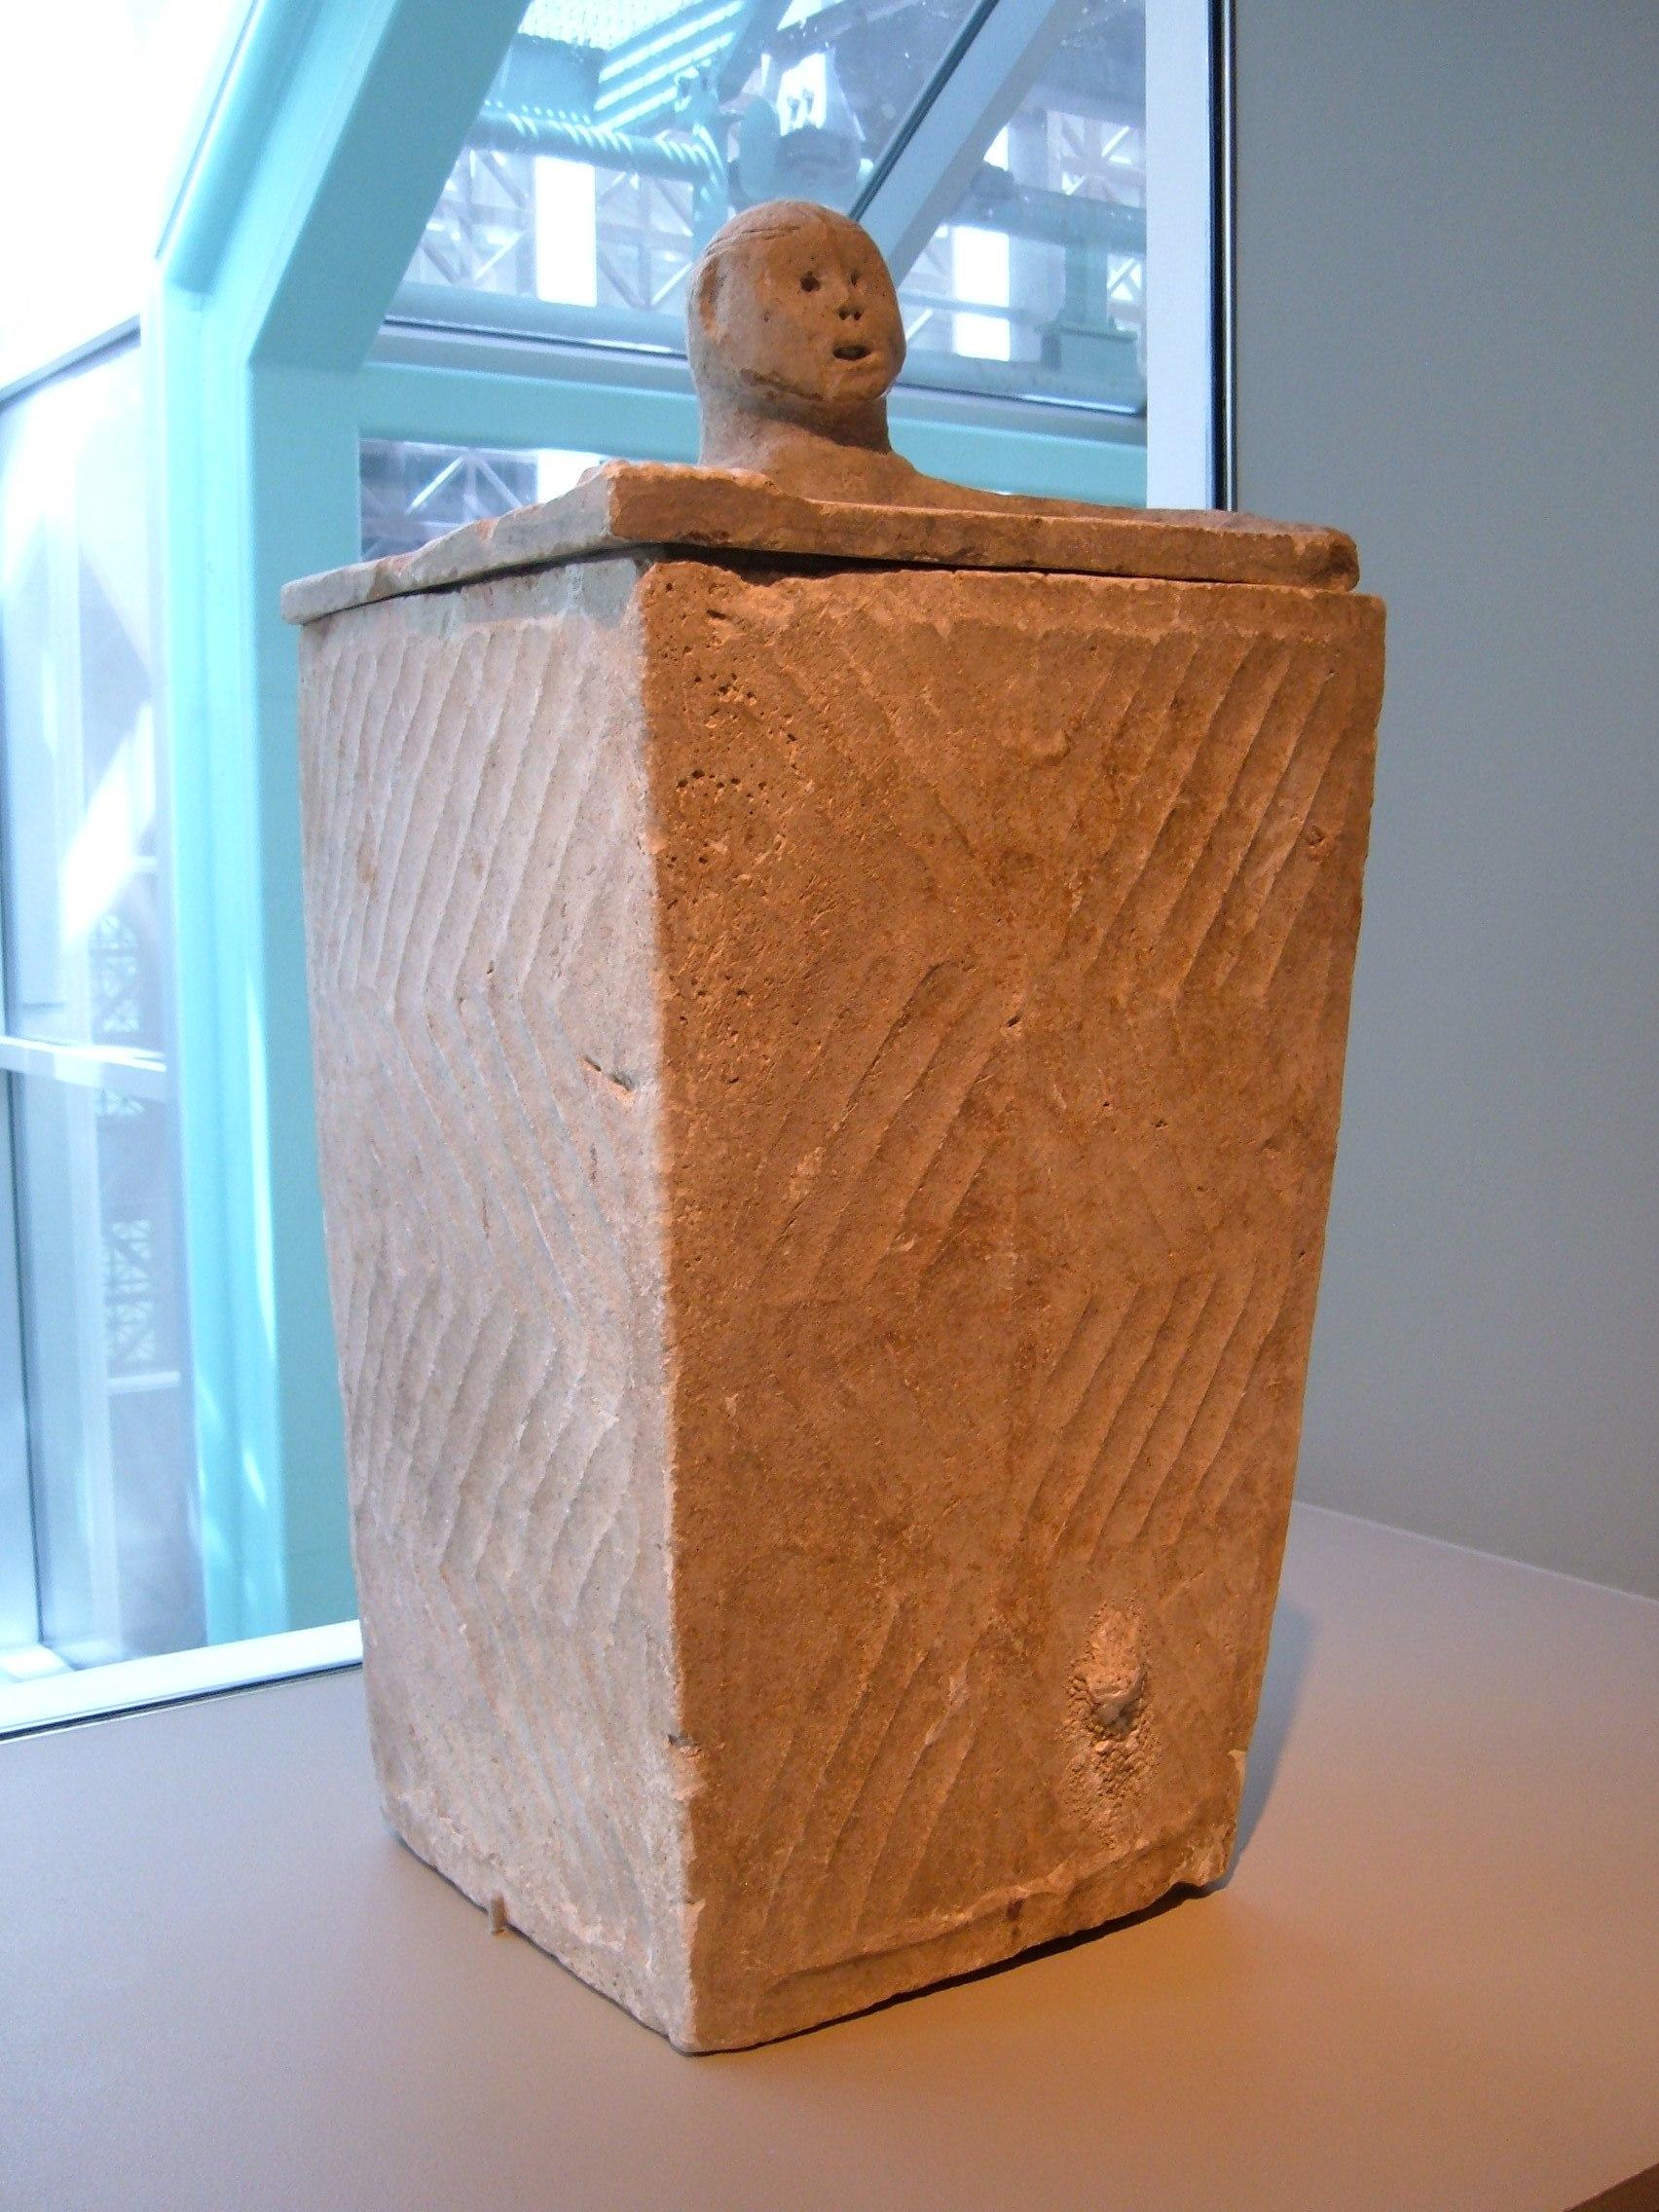 file mindanao burial urn 1 sf asian art museum jpg wikimedia commons